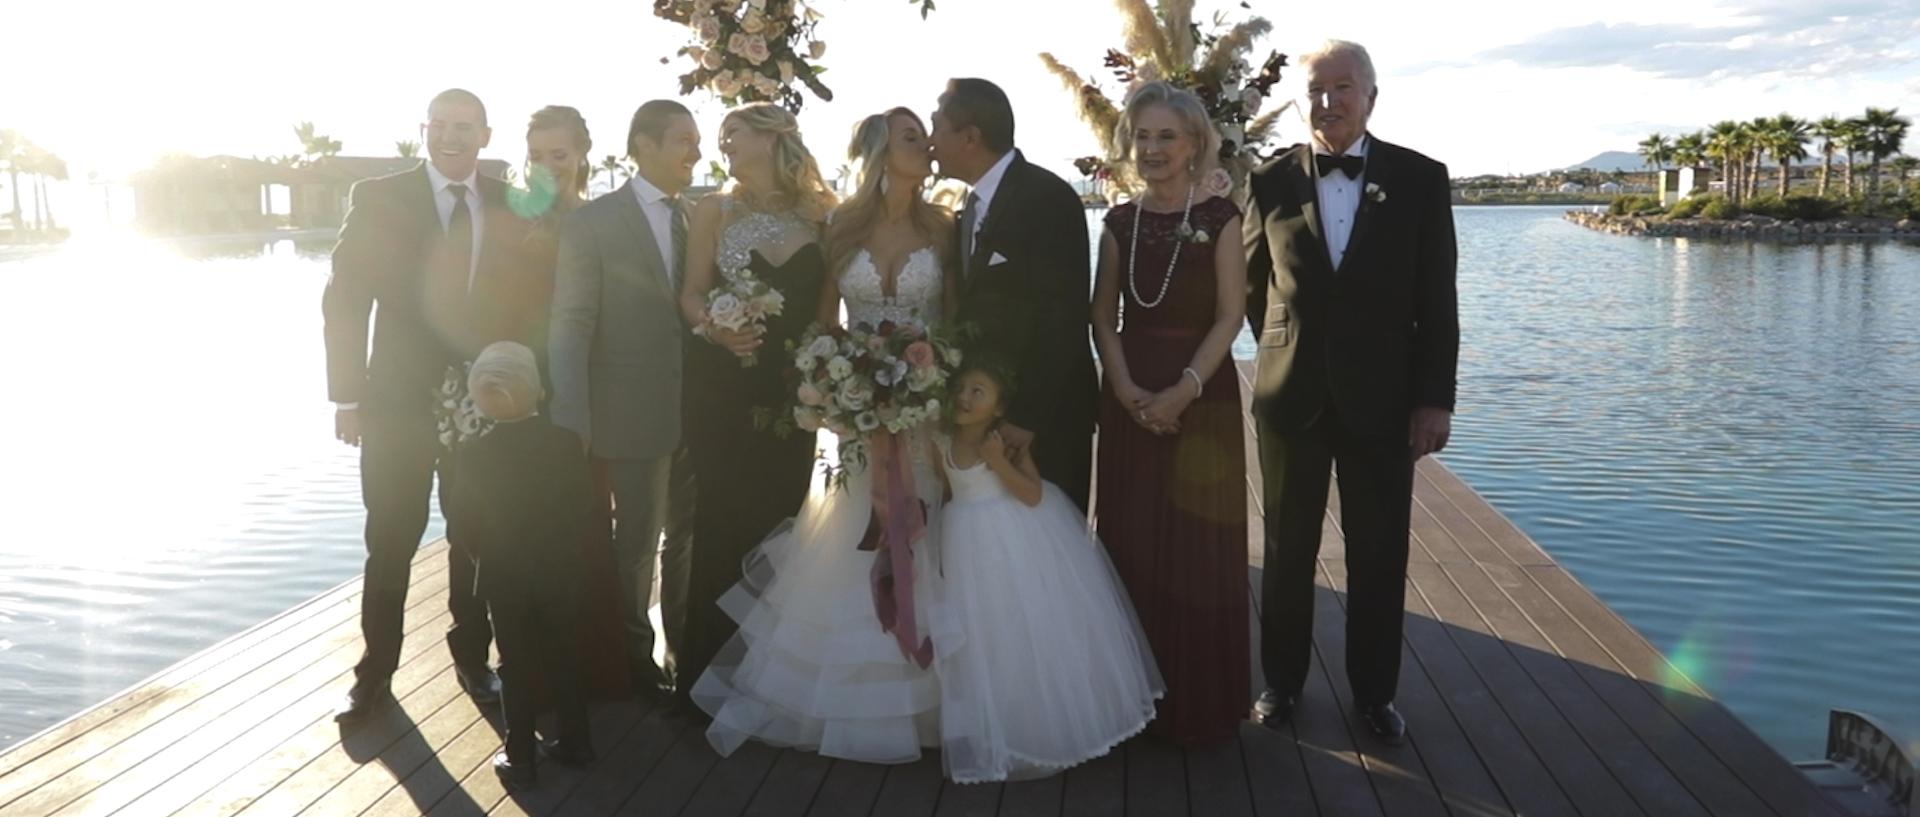 Jessica and Jeffrey Wedding Story.06_36_04_18.Still013.jpg